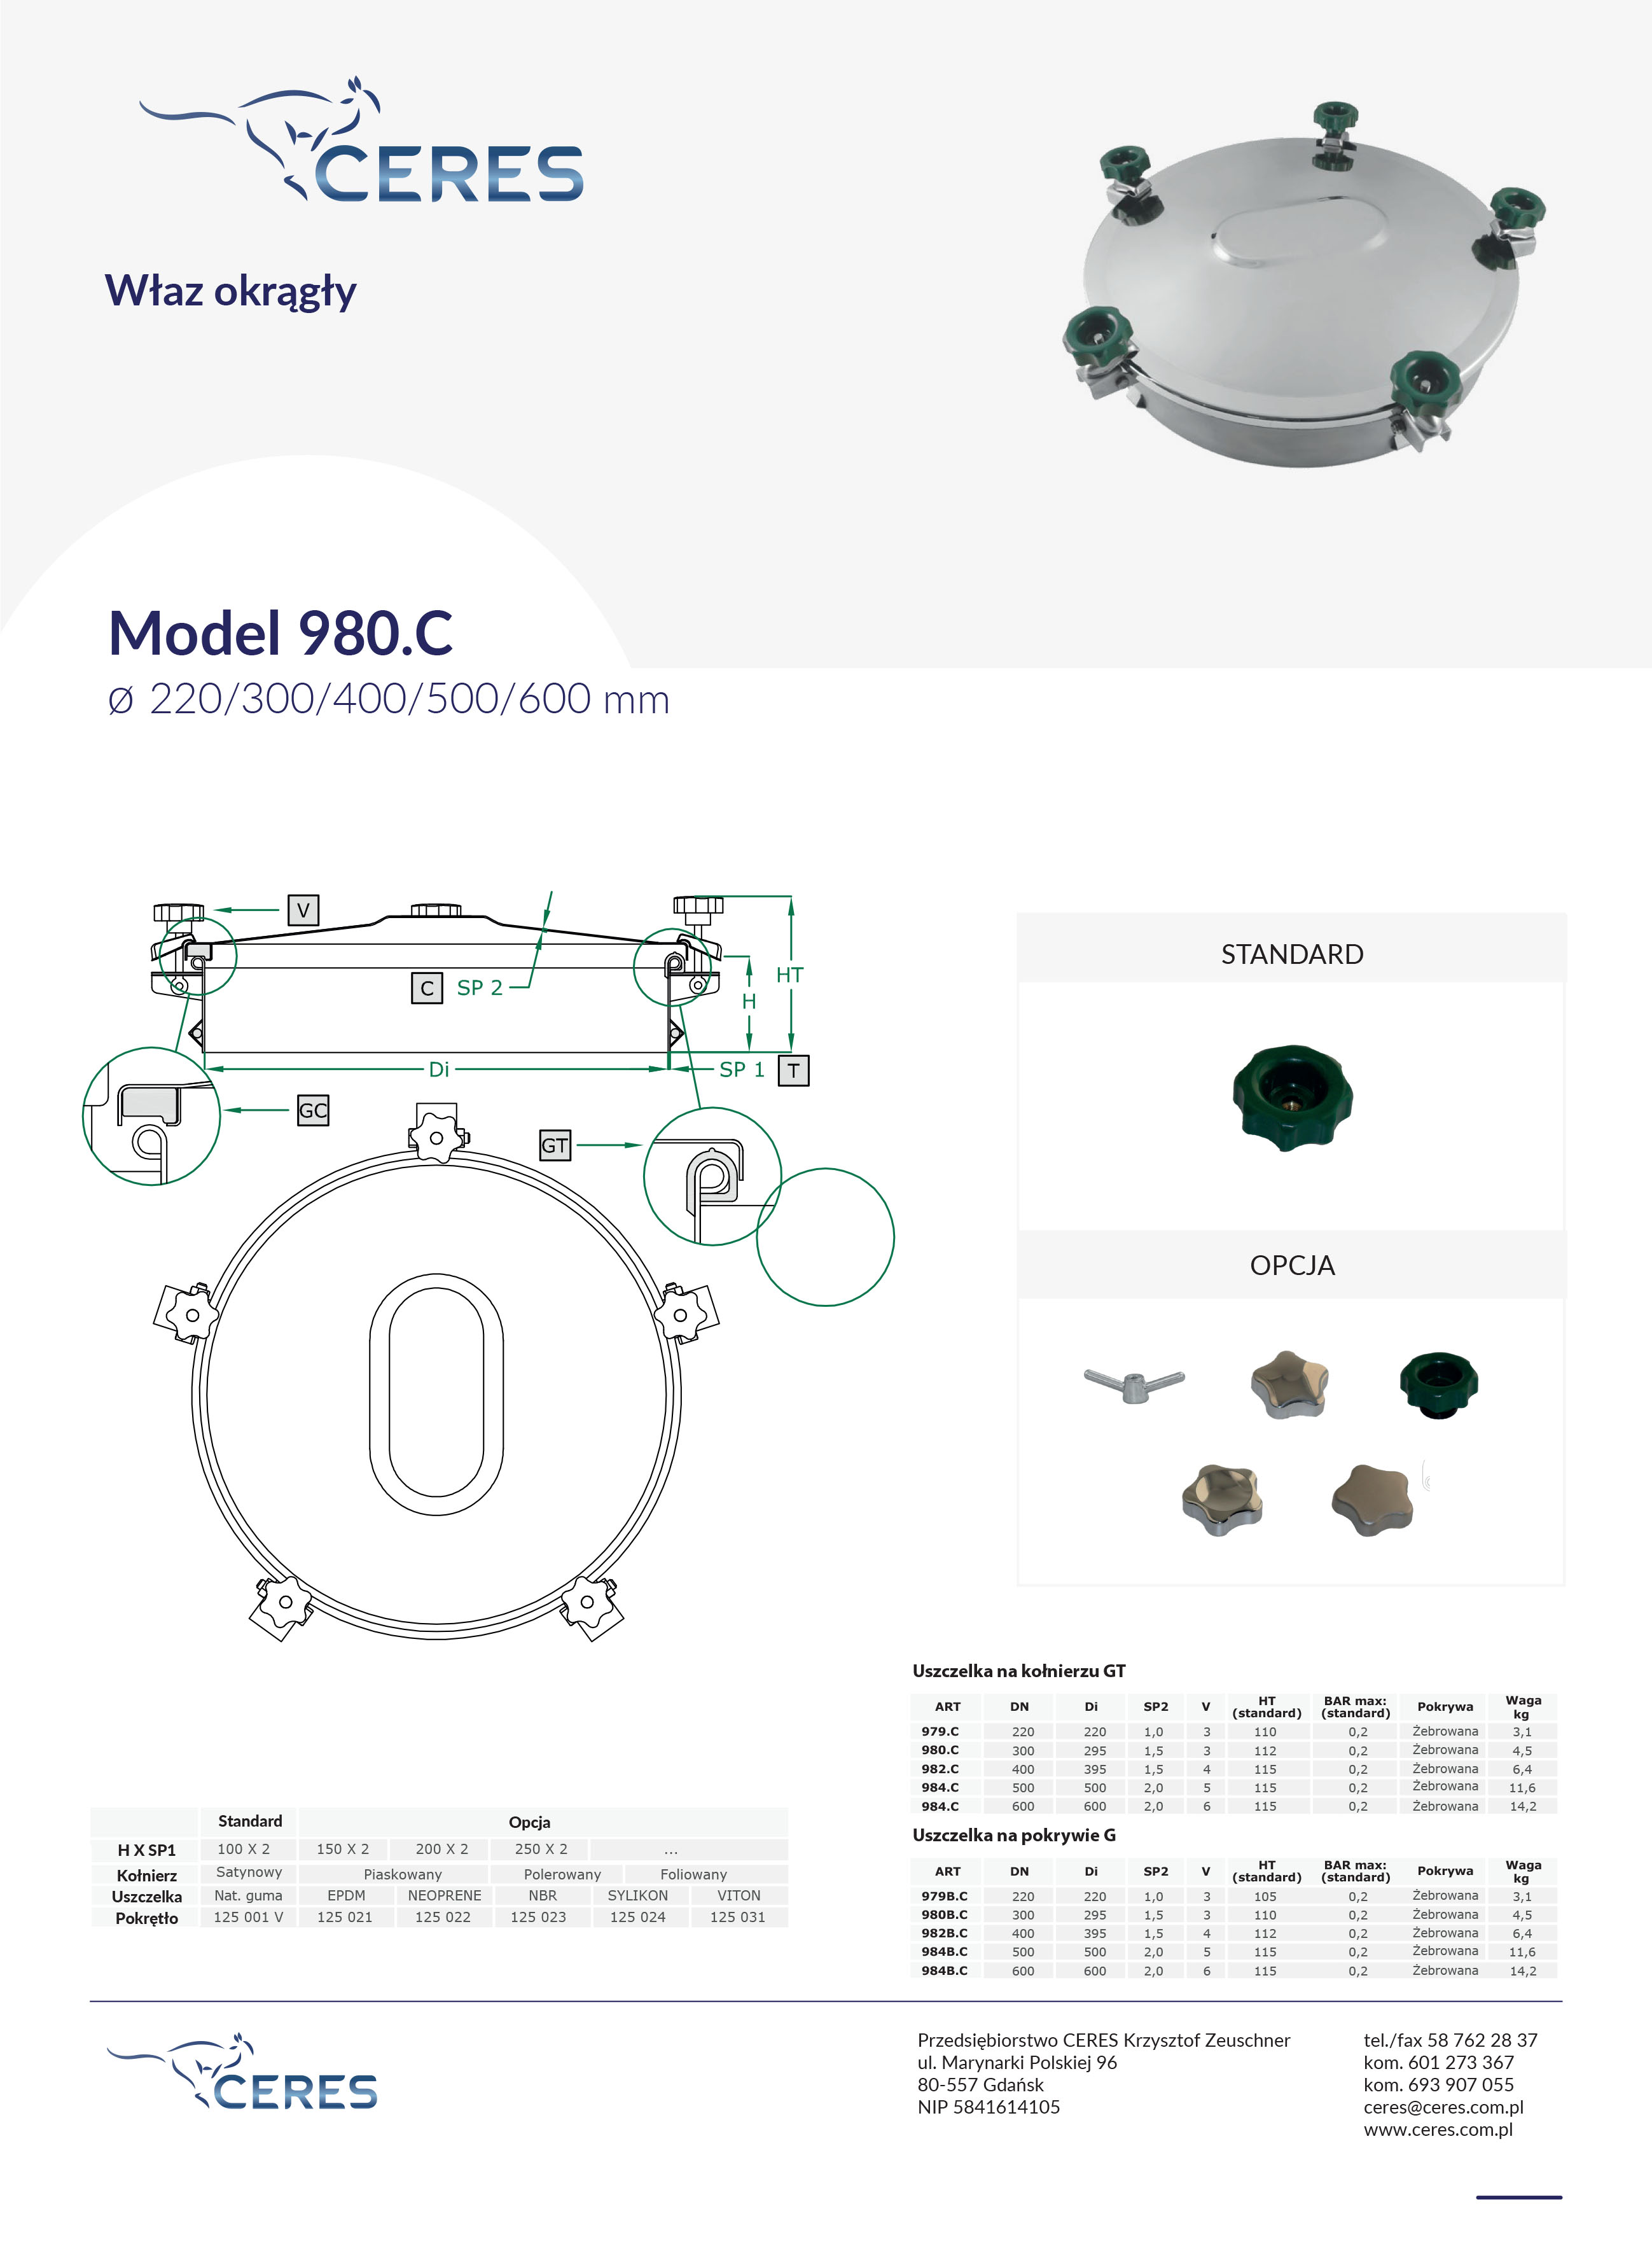 Model980c